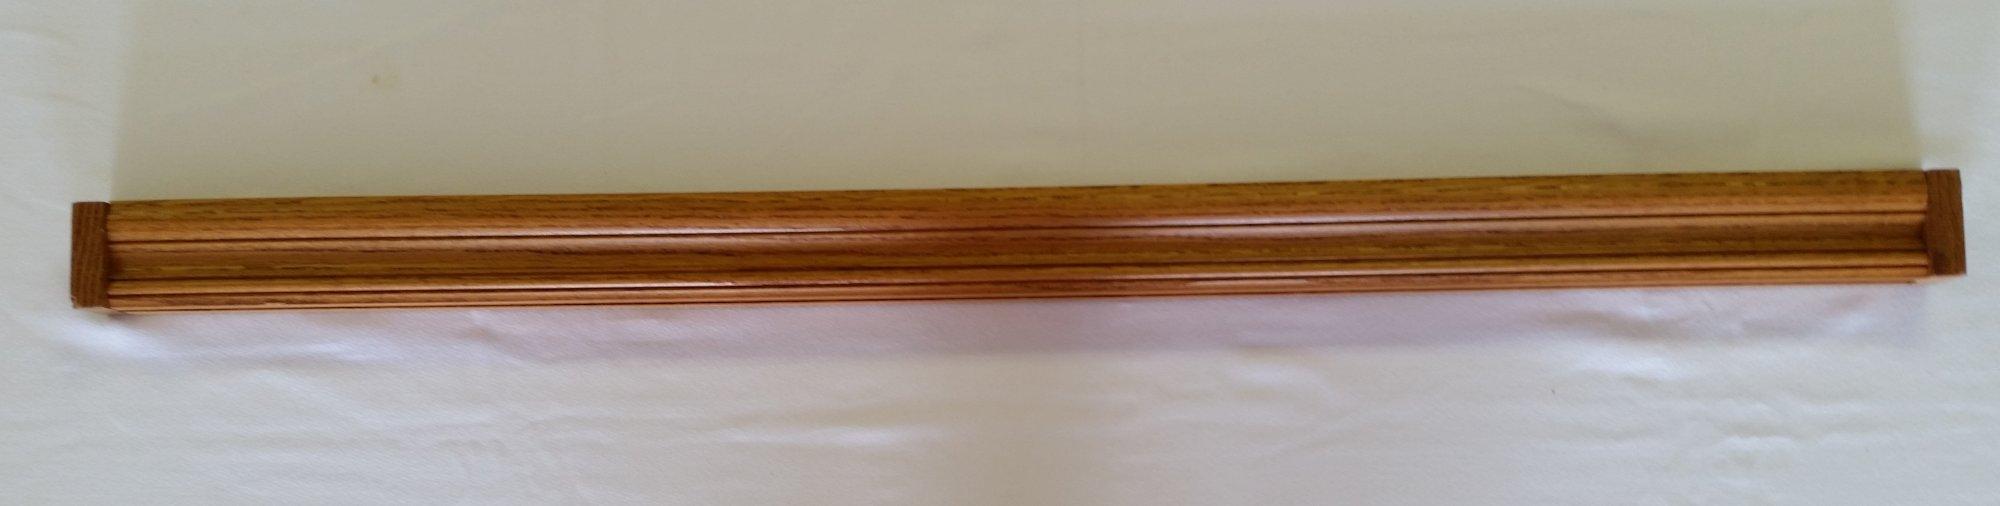 43.5 Wood Quilt Hanger